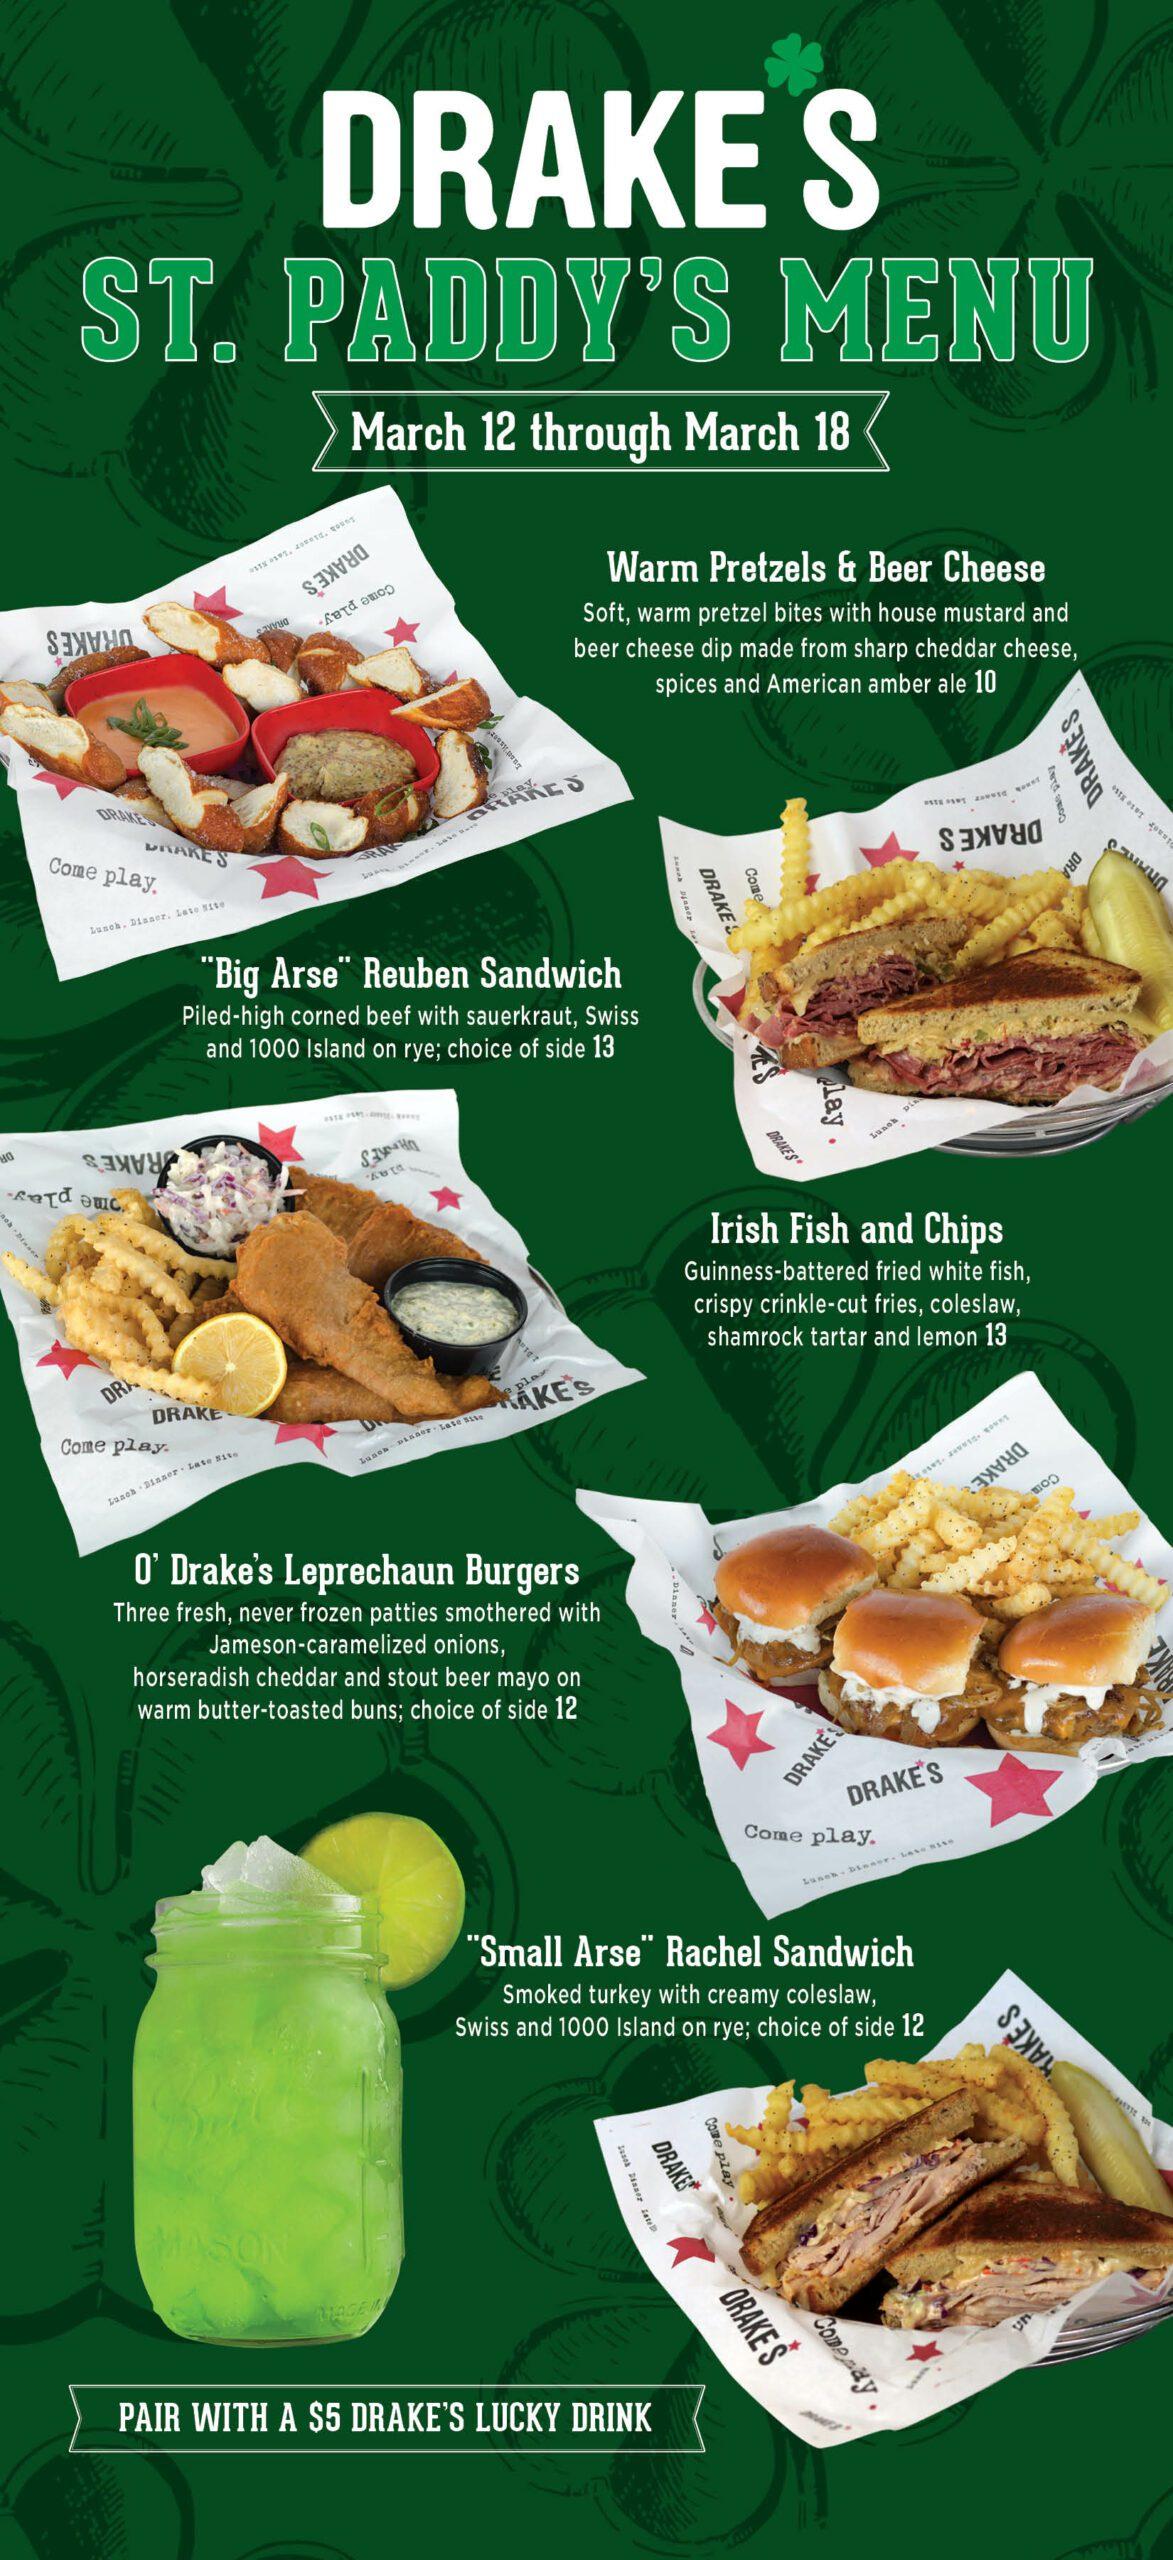 Social Media Post Ideas for St. Patrick's Day menu